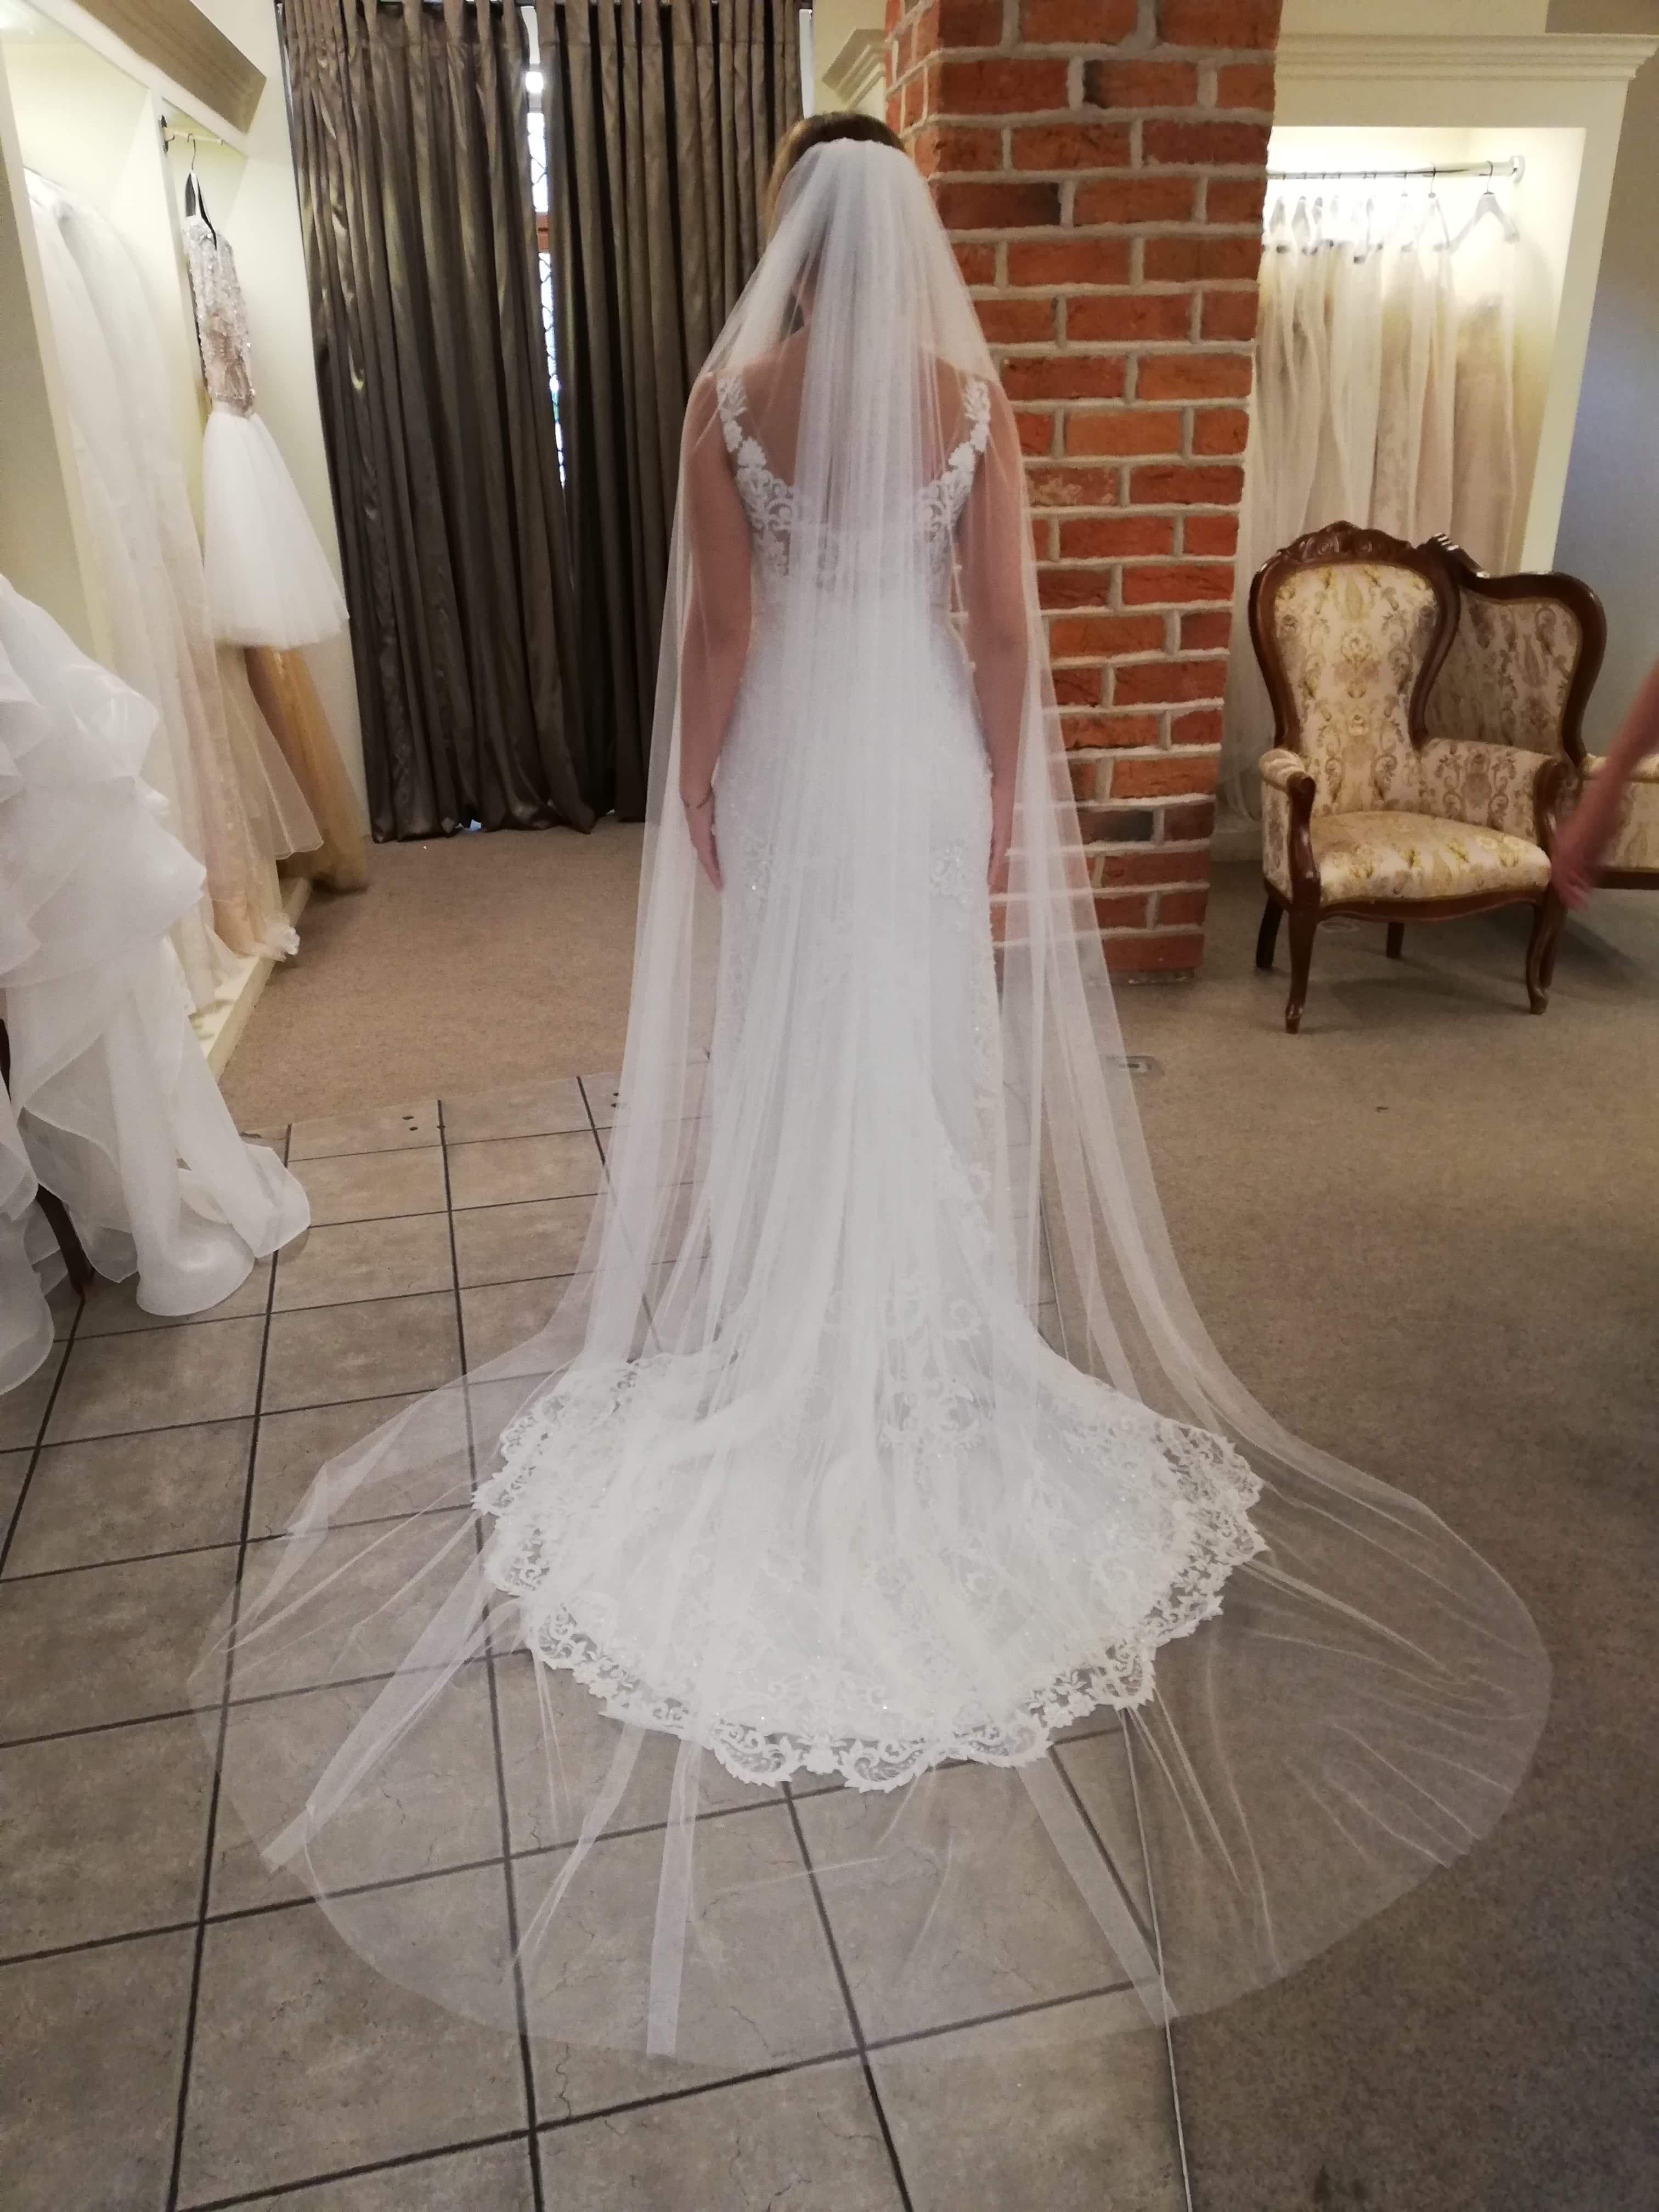 aa201c7fc5 Gala Artemia suknia ślubna dopasowana krysztalki - Szczecin ...